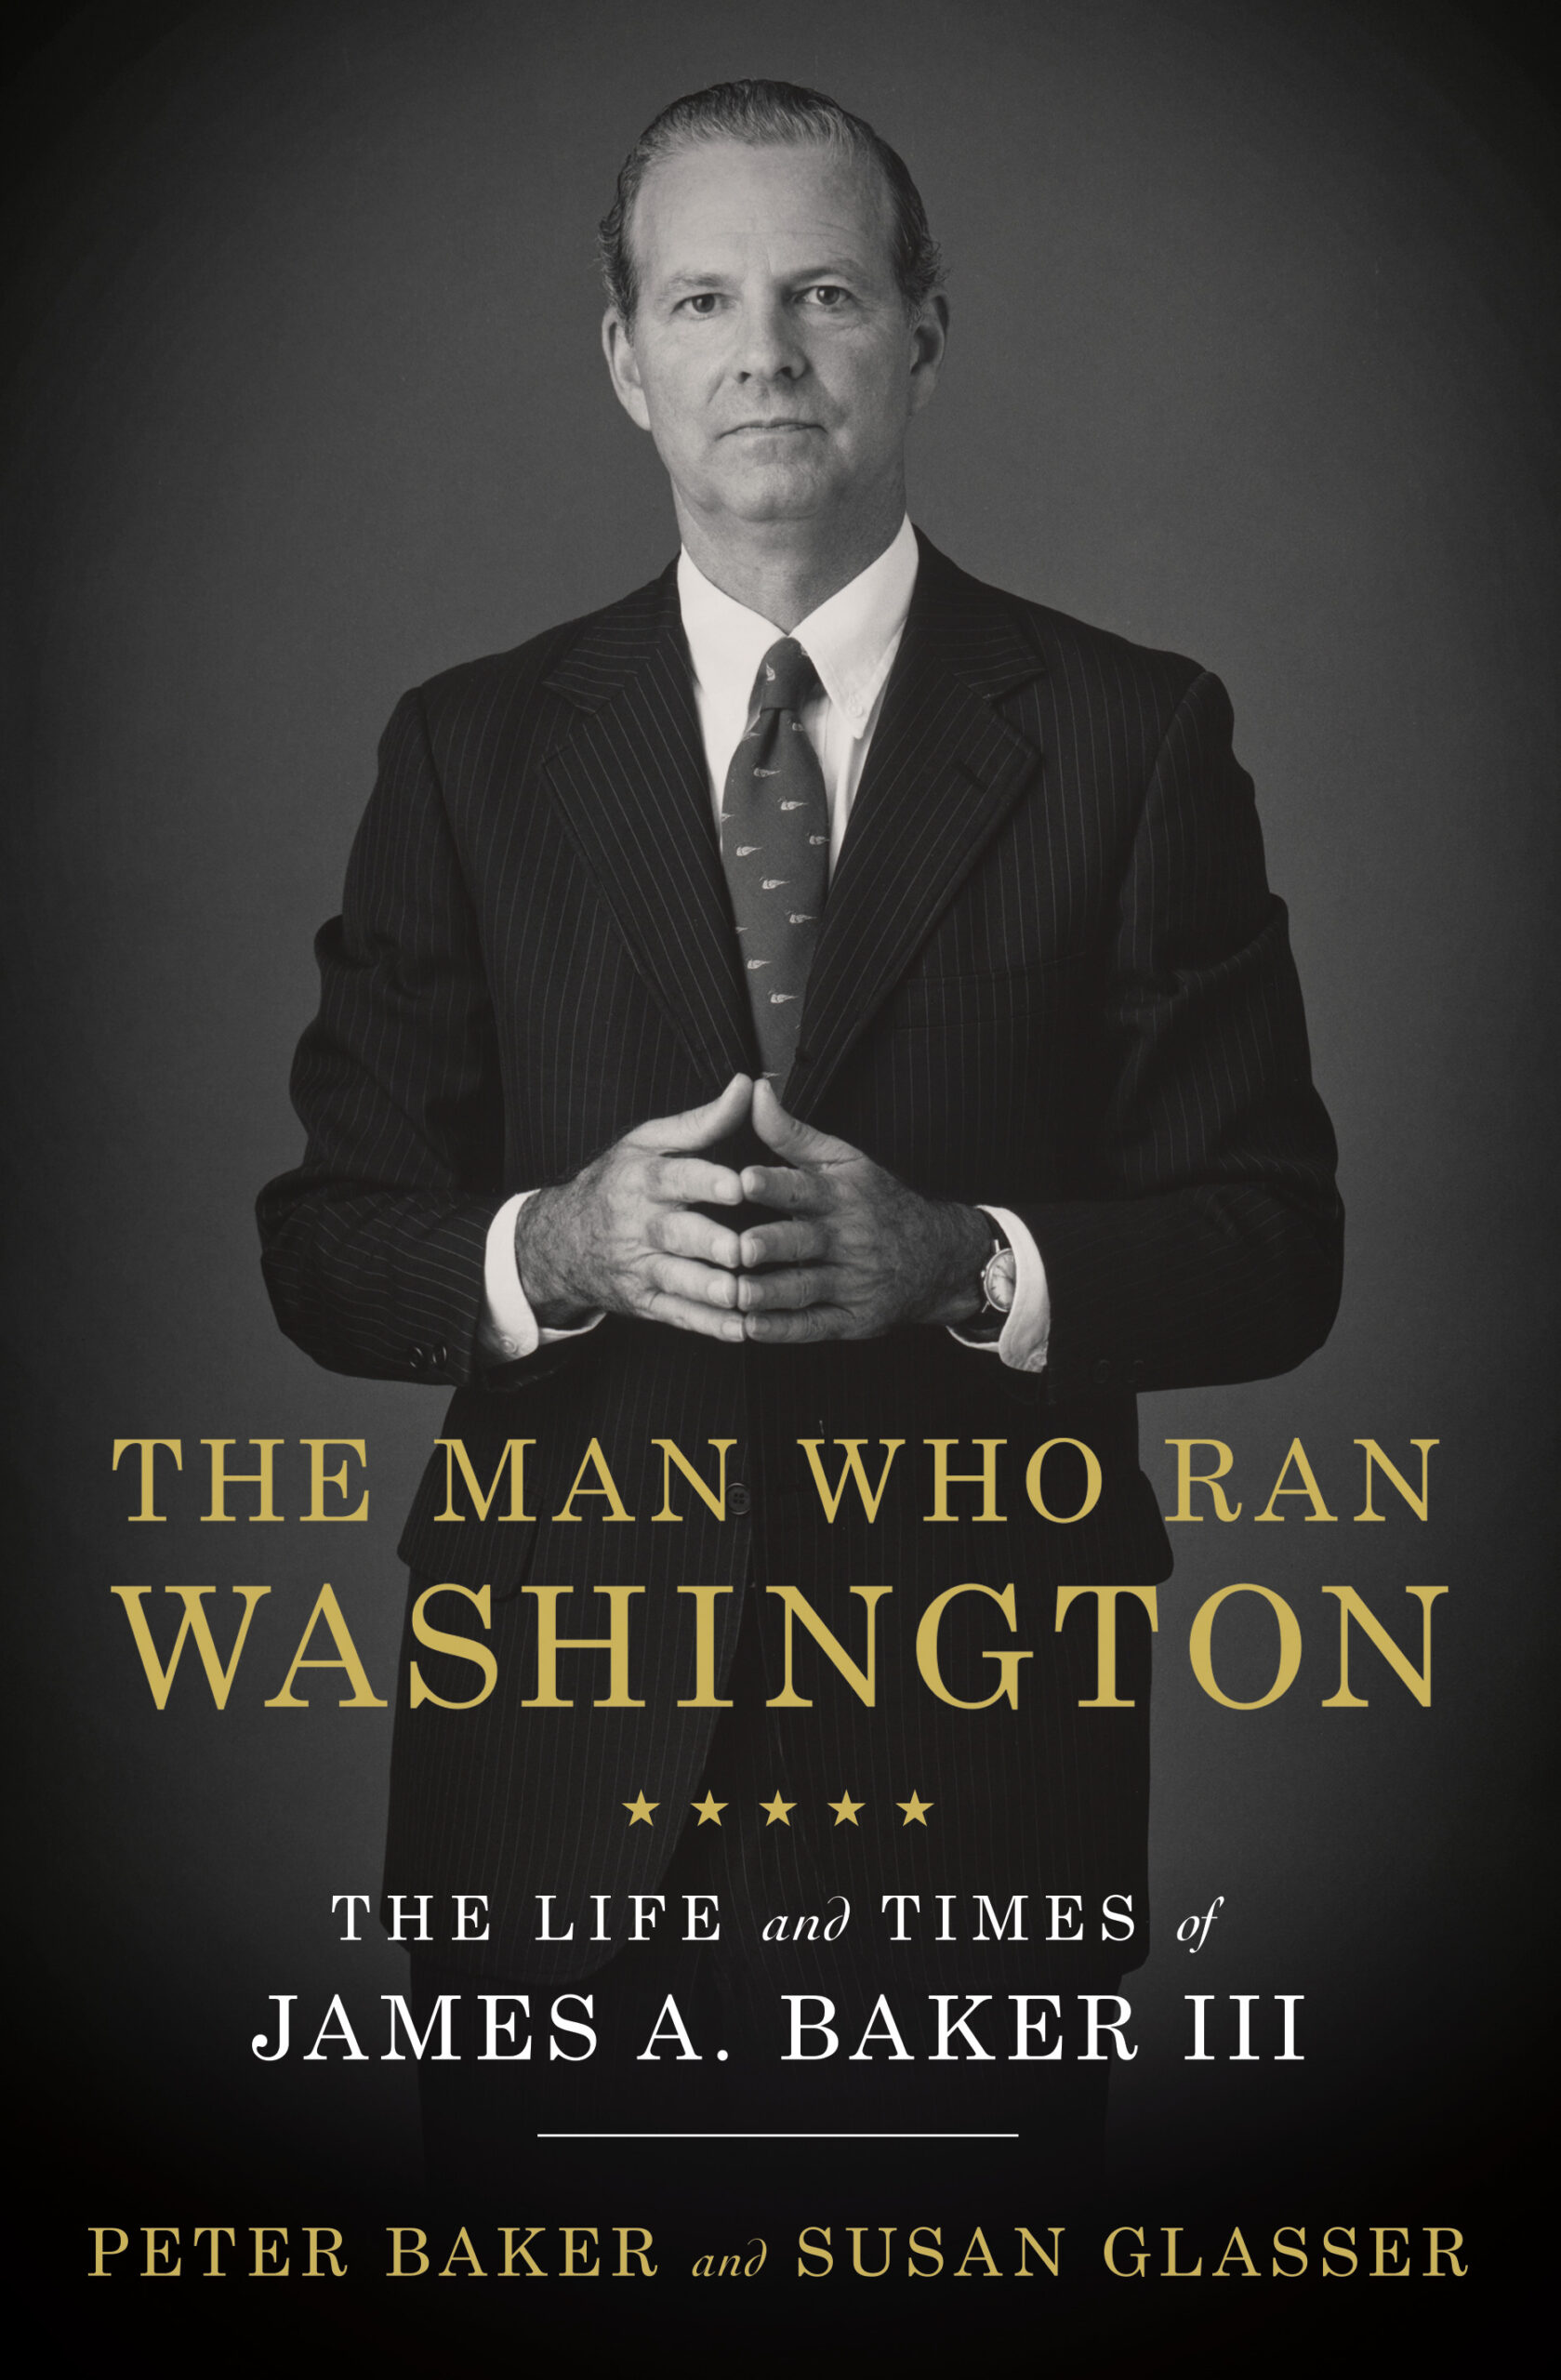 The man who ran Washington: James A. Baker III